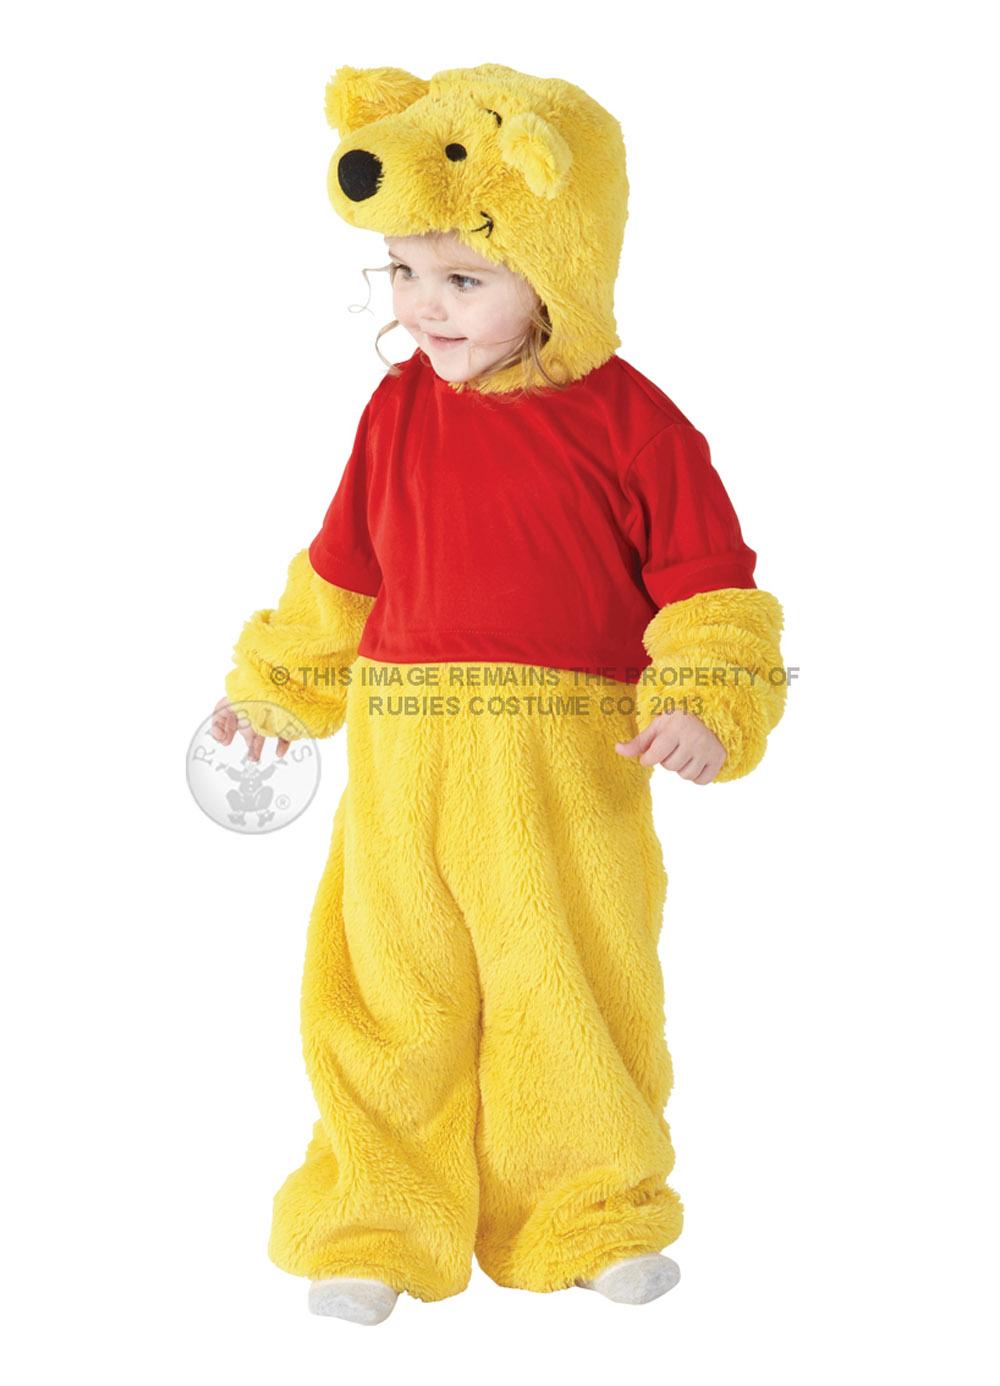 disney winnie the pooh costume disney costumes mega. Black Bedroom Furniture Sets. Home Design Ideas